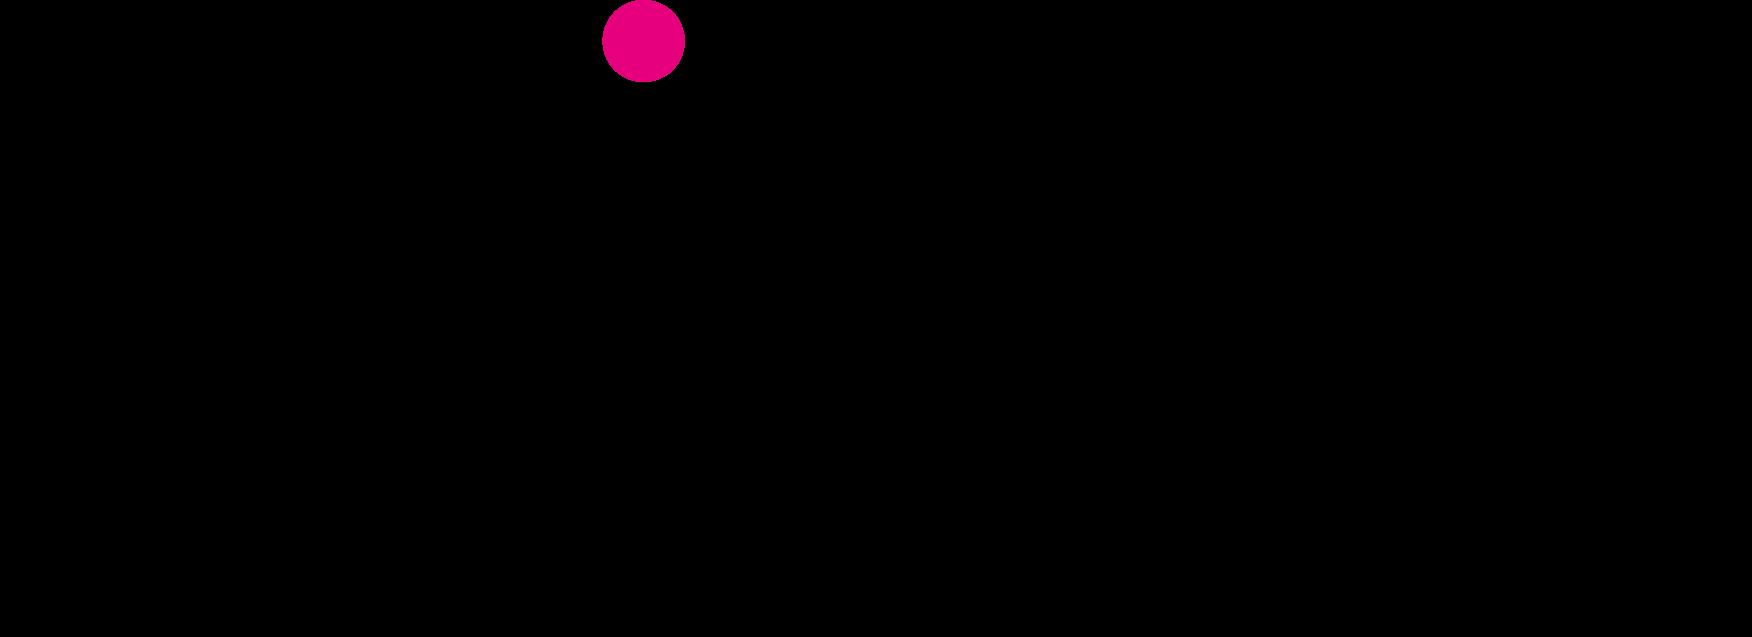 Logo_magenta_black